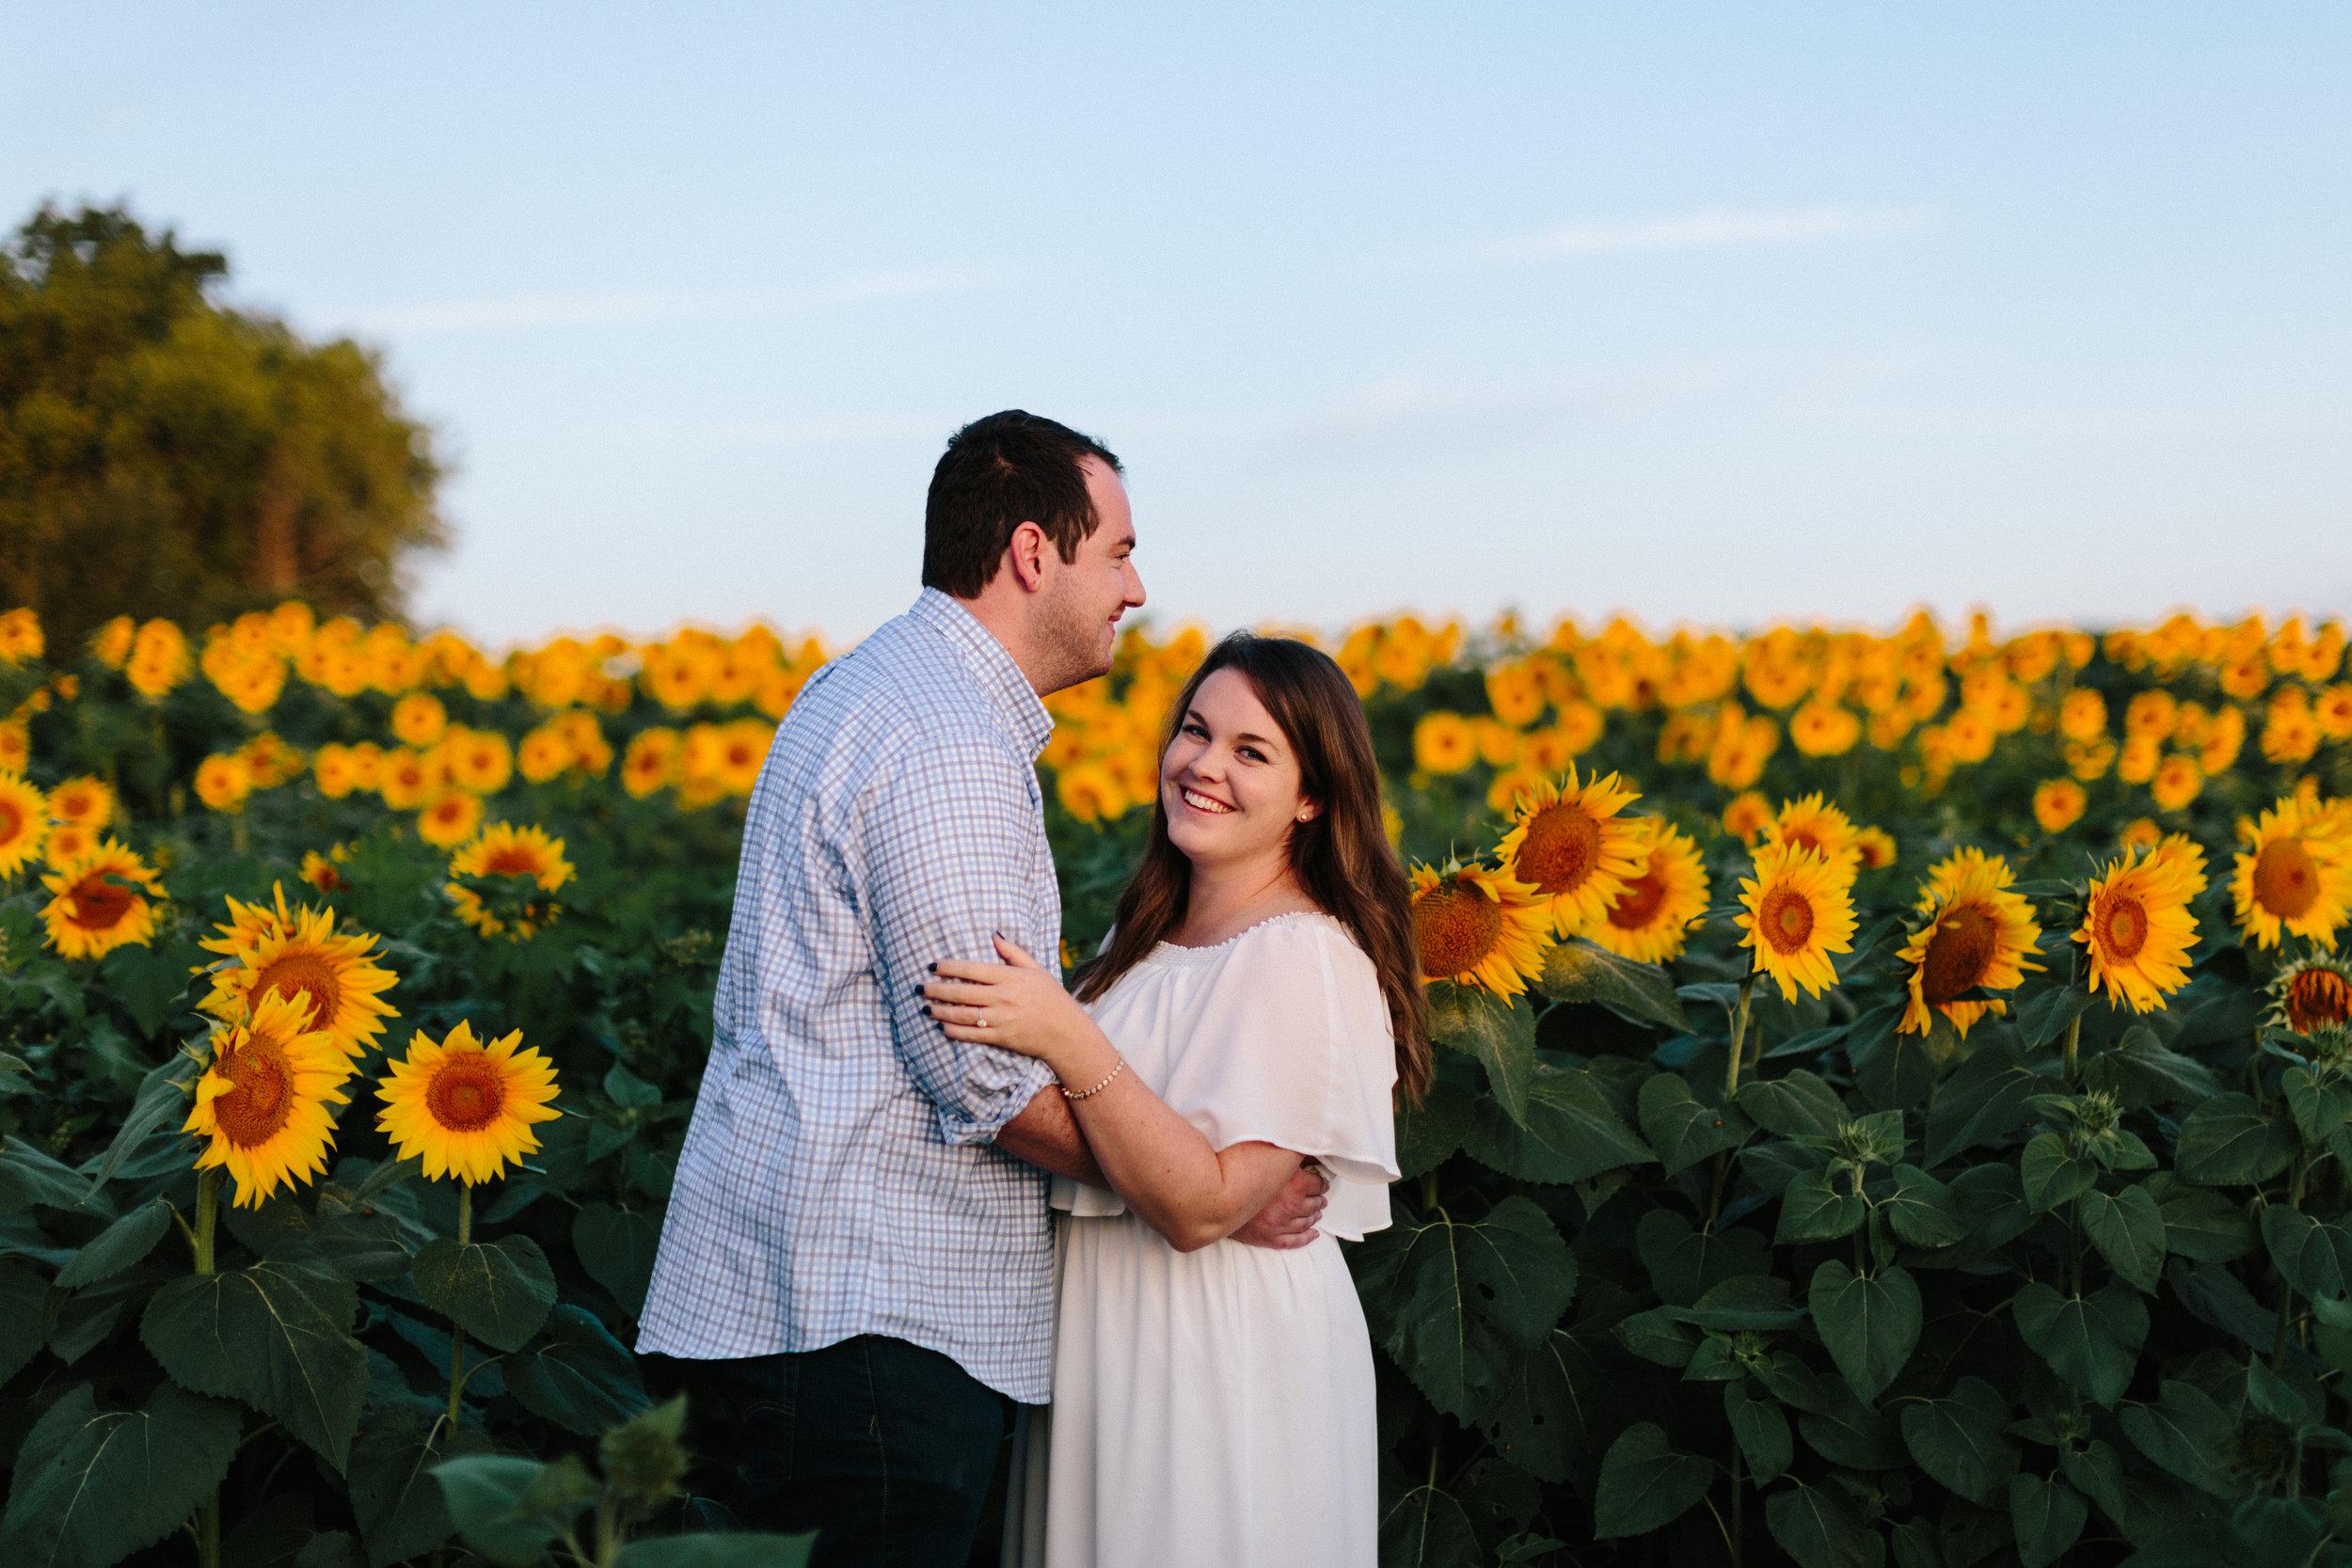 alyssa barletter photography sunflower field photos-6.jpg